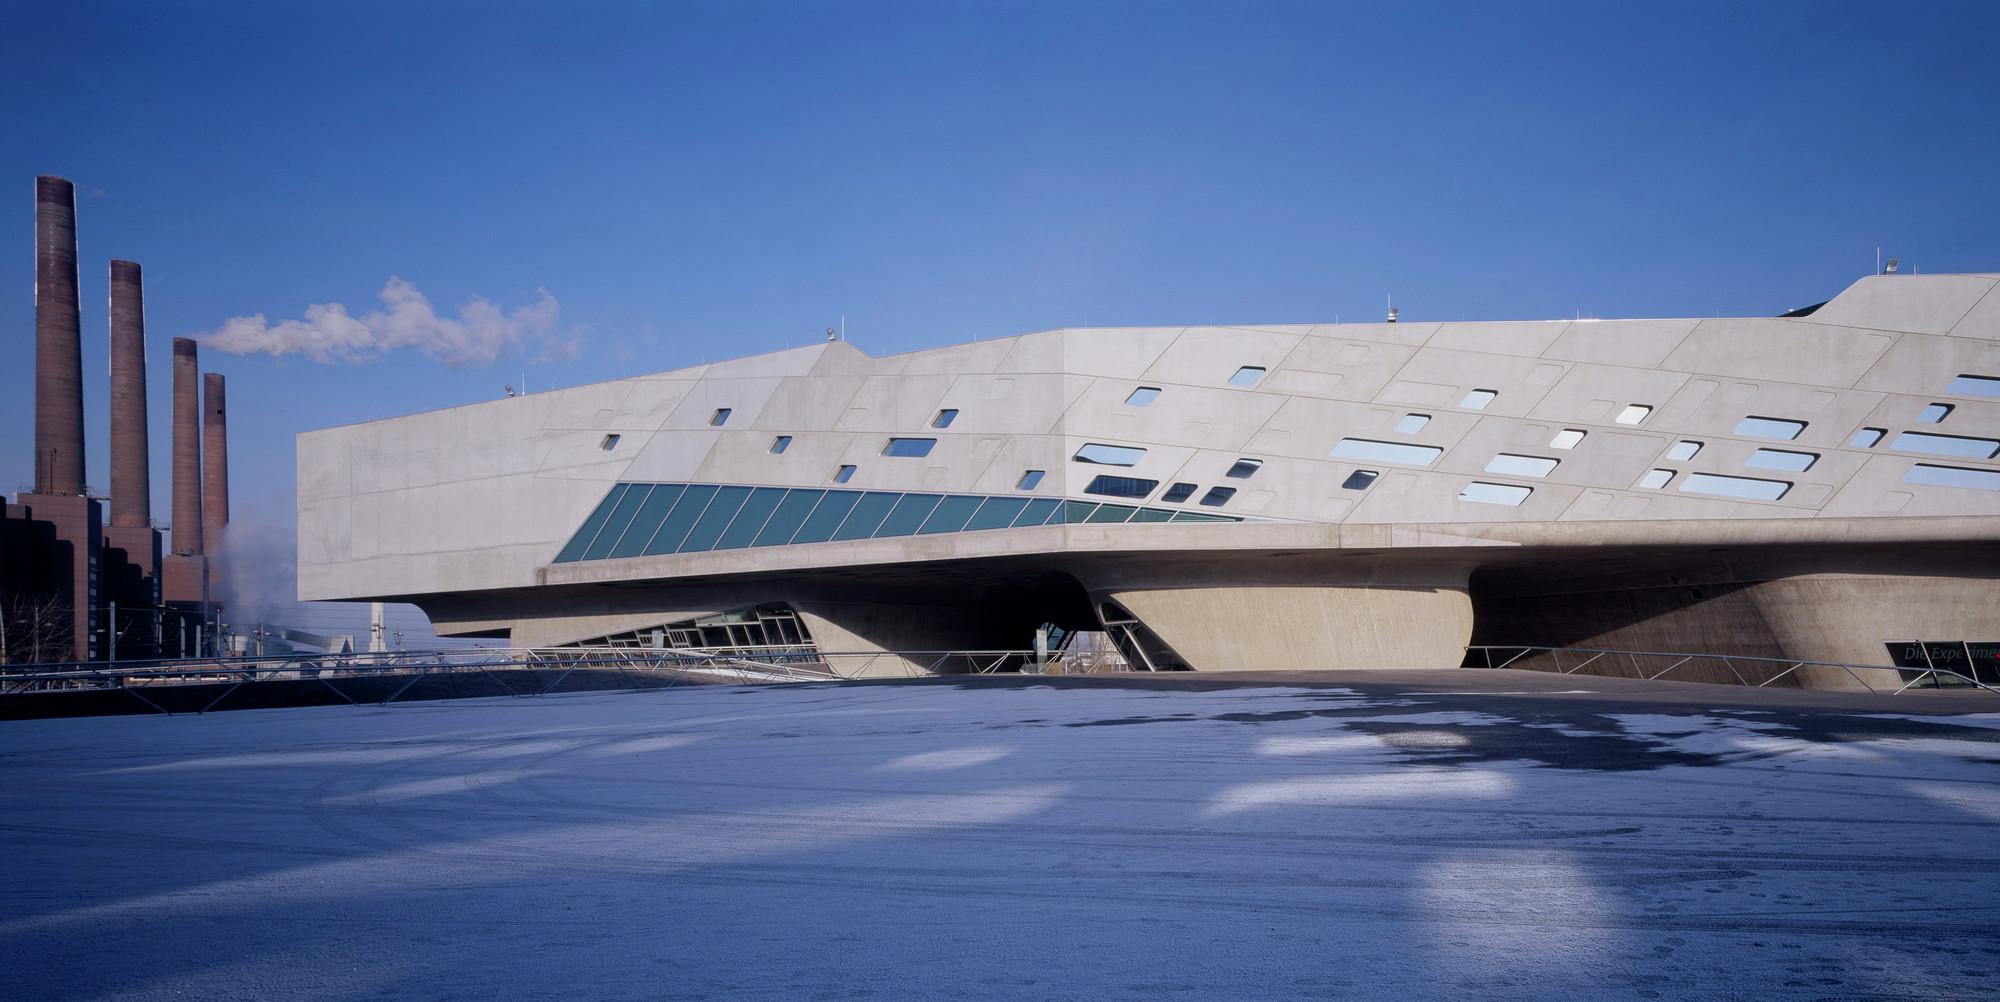 Phaeno Science Centre by  Zaha Hadid Architects  Wolfsburg, Germany Photo:Werner Huthmacher